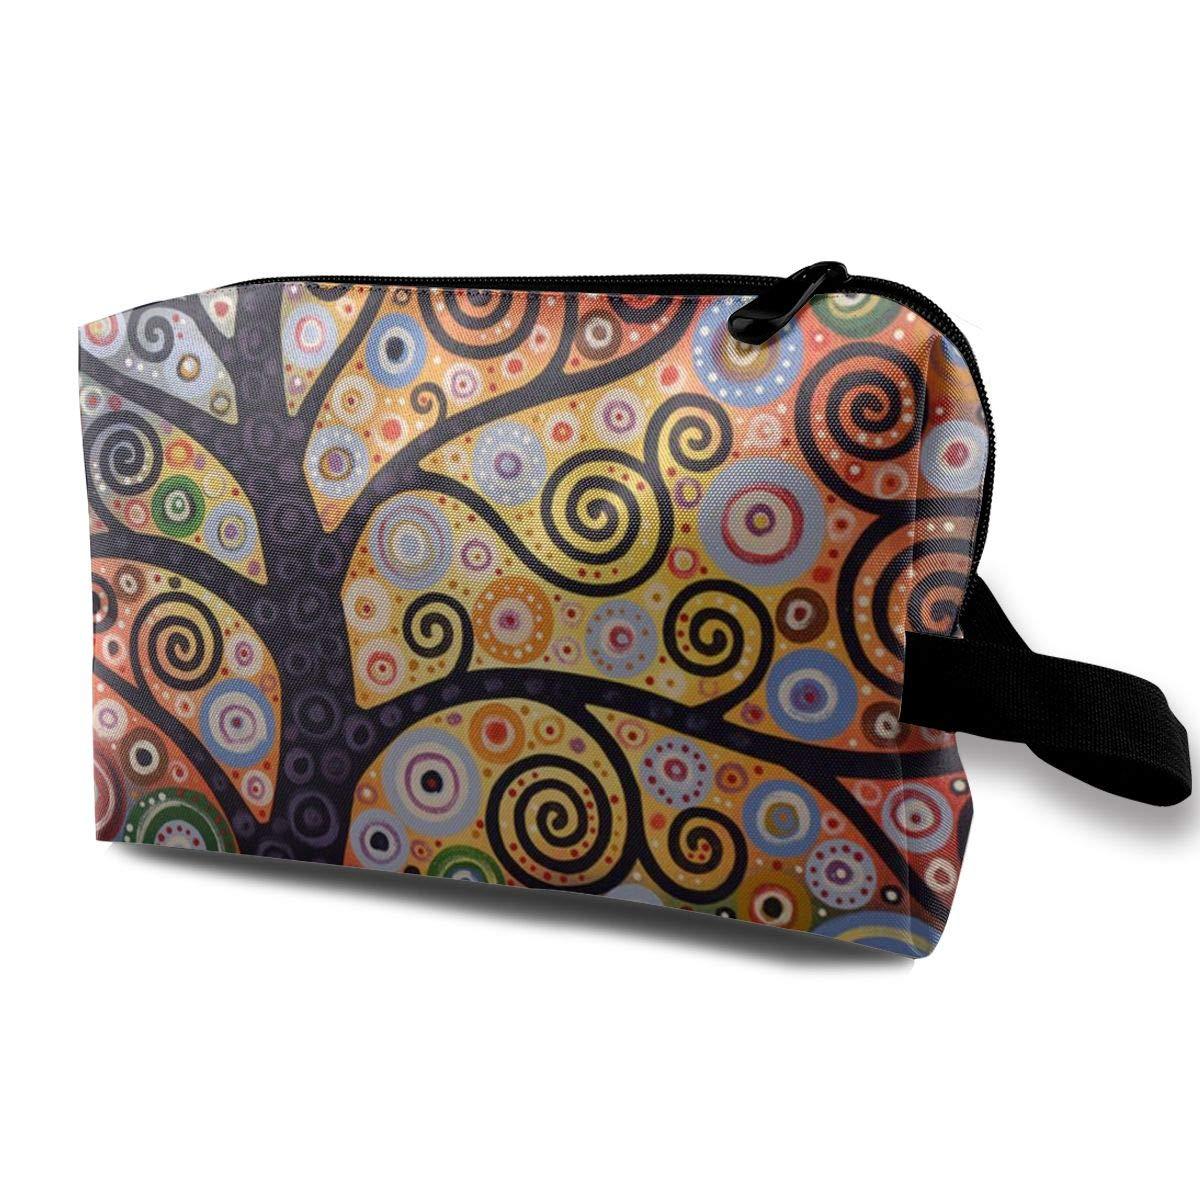 Beautiful Art Tree Toiletry Bag Multifunction Cosmetic Bag Portable Makeup Pouch Travel Organizer Bag For Women Girls